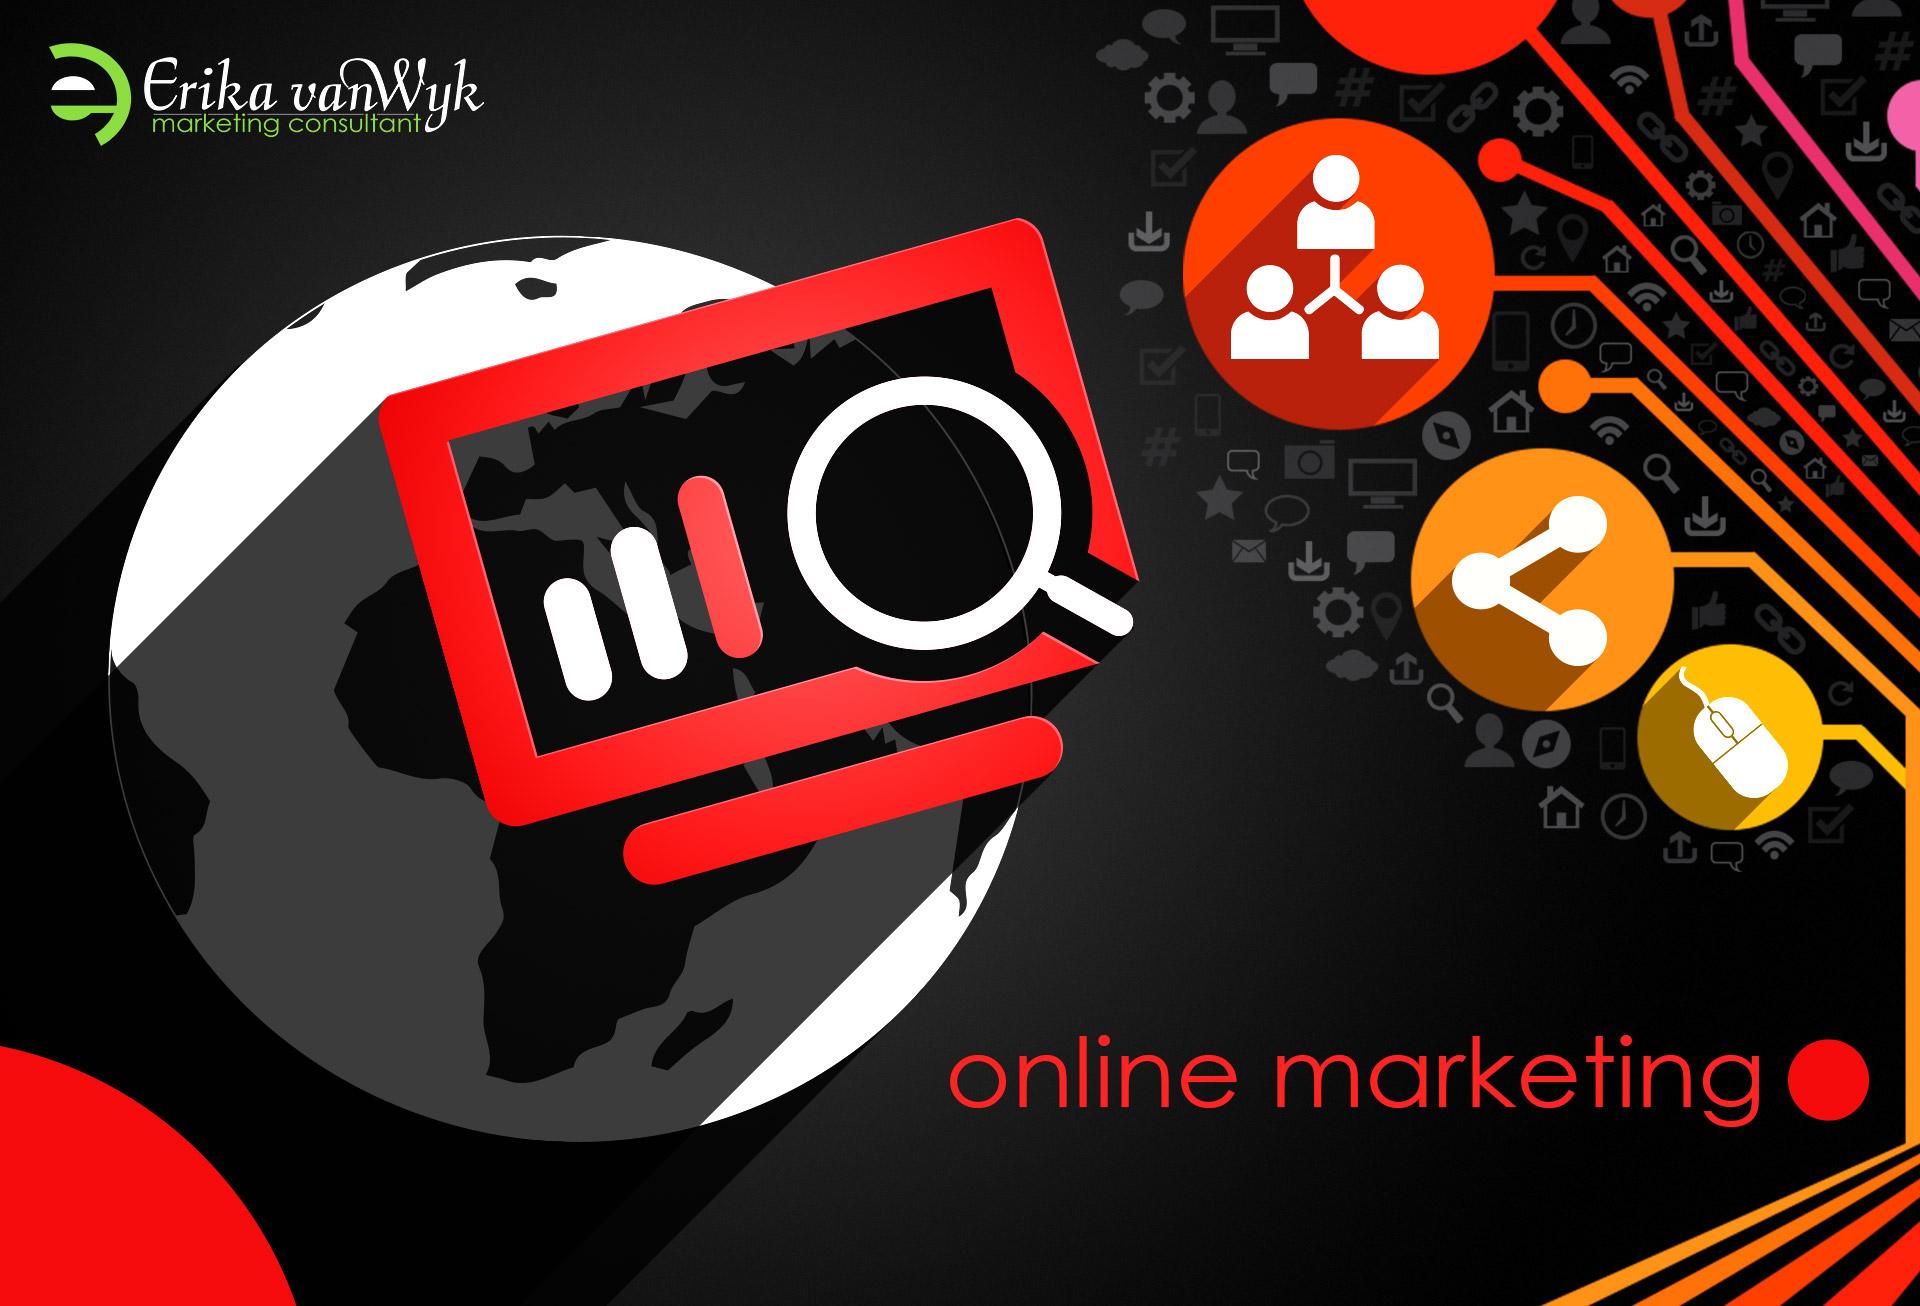 SERVICES - ONLINE MARKETING & ADVERTISING: Erika van Wyk Marketing Consultant